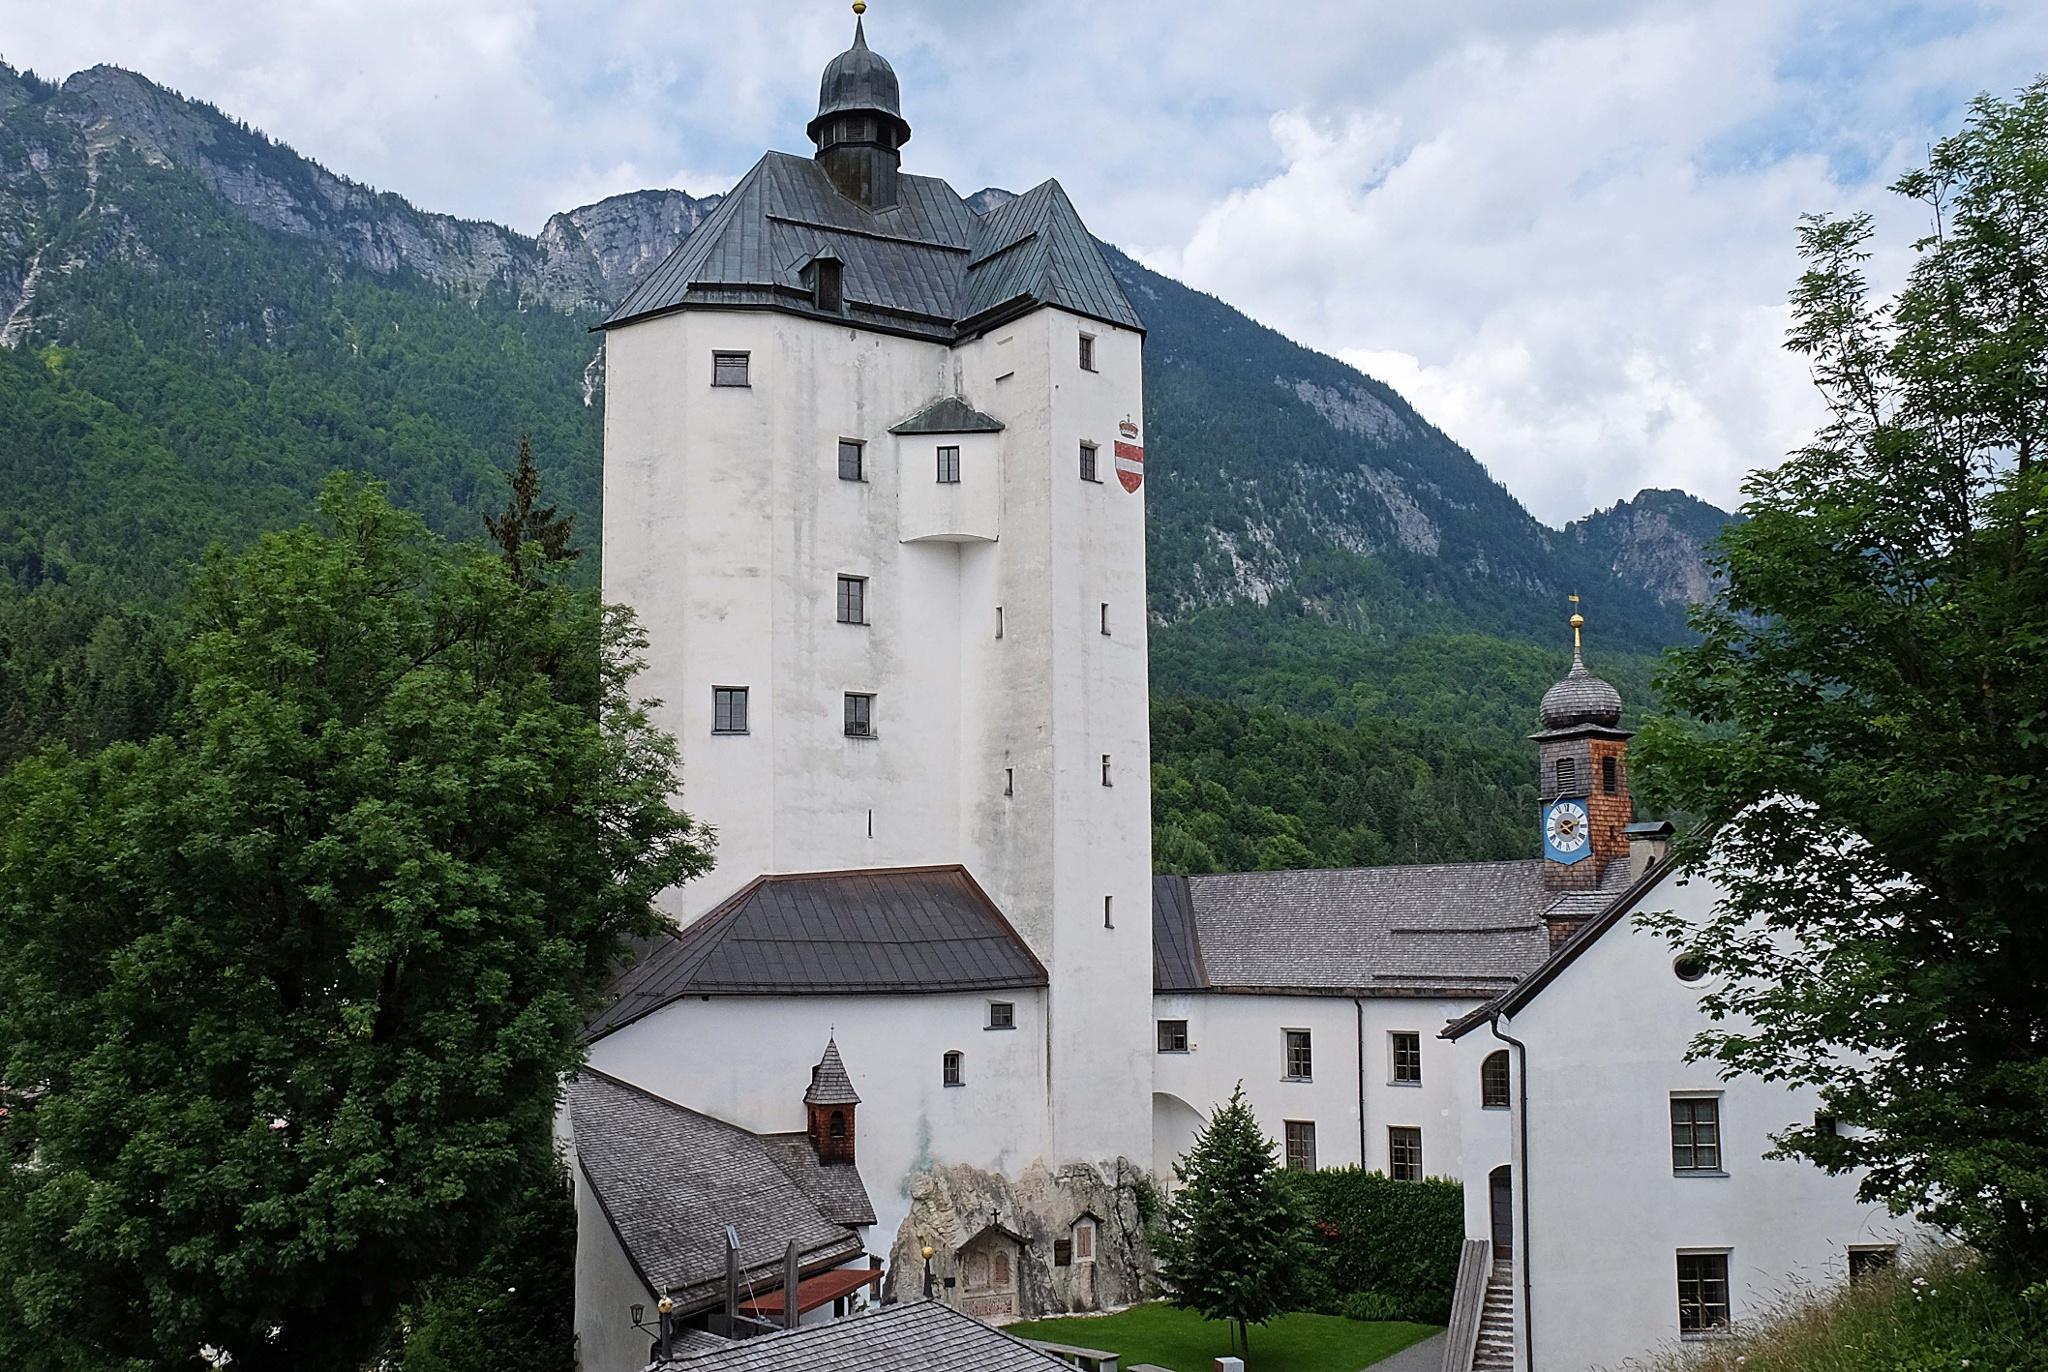 Mariastein in Tirol - Radtour ab Kiefersfelden